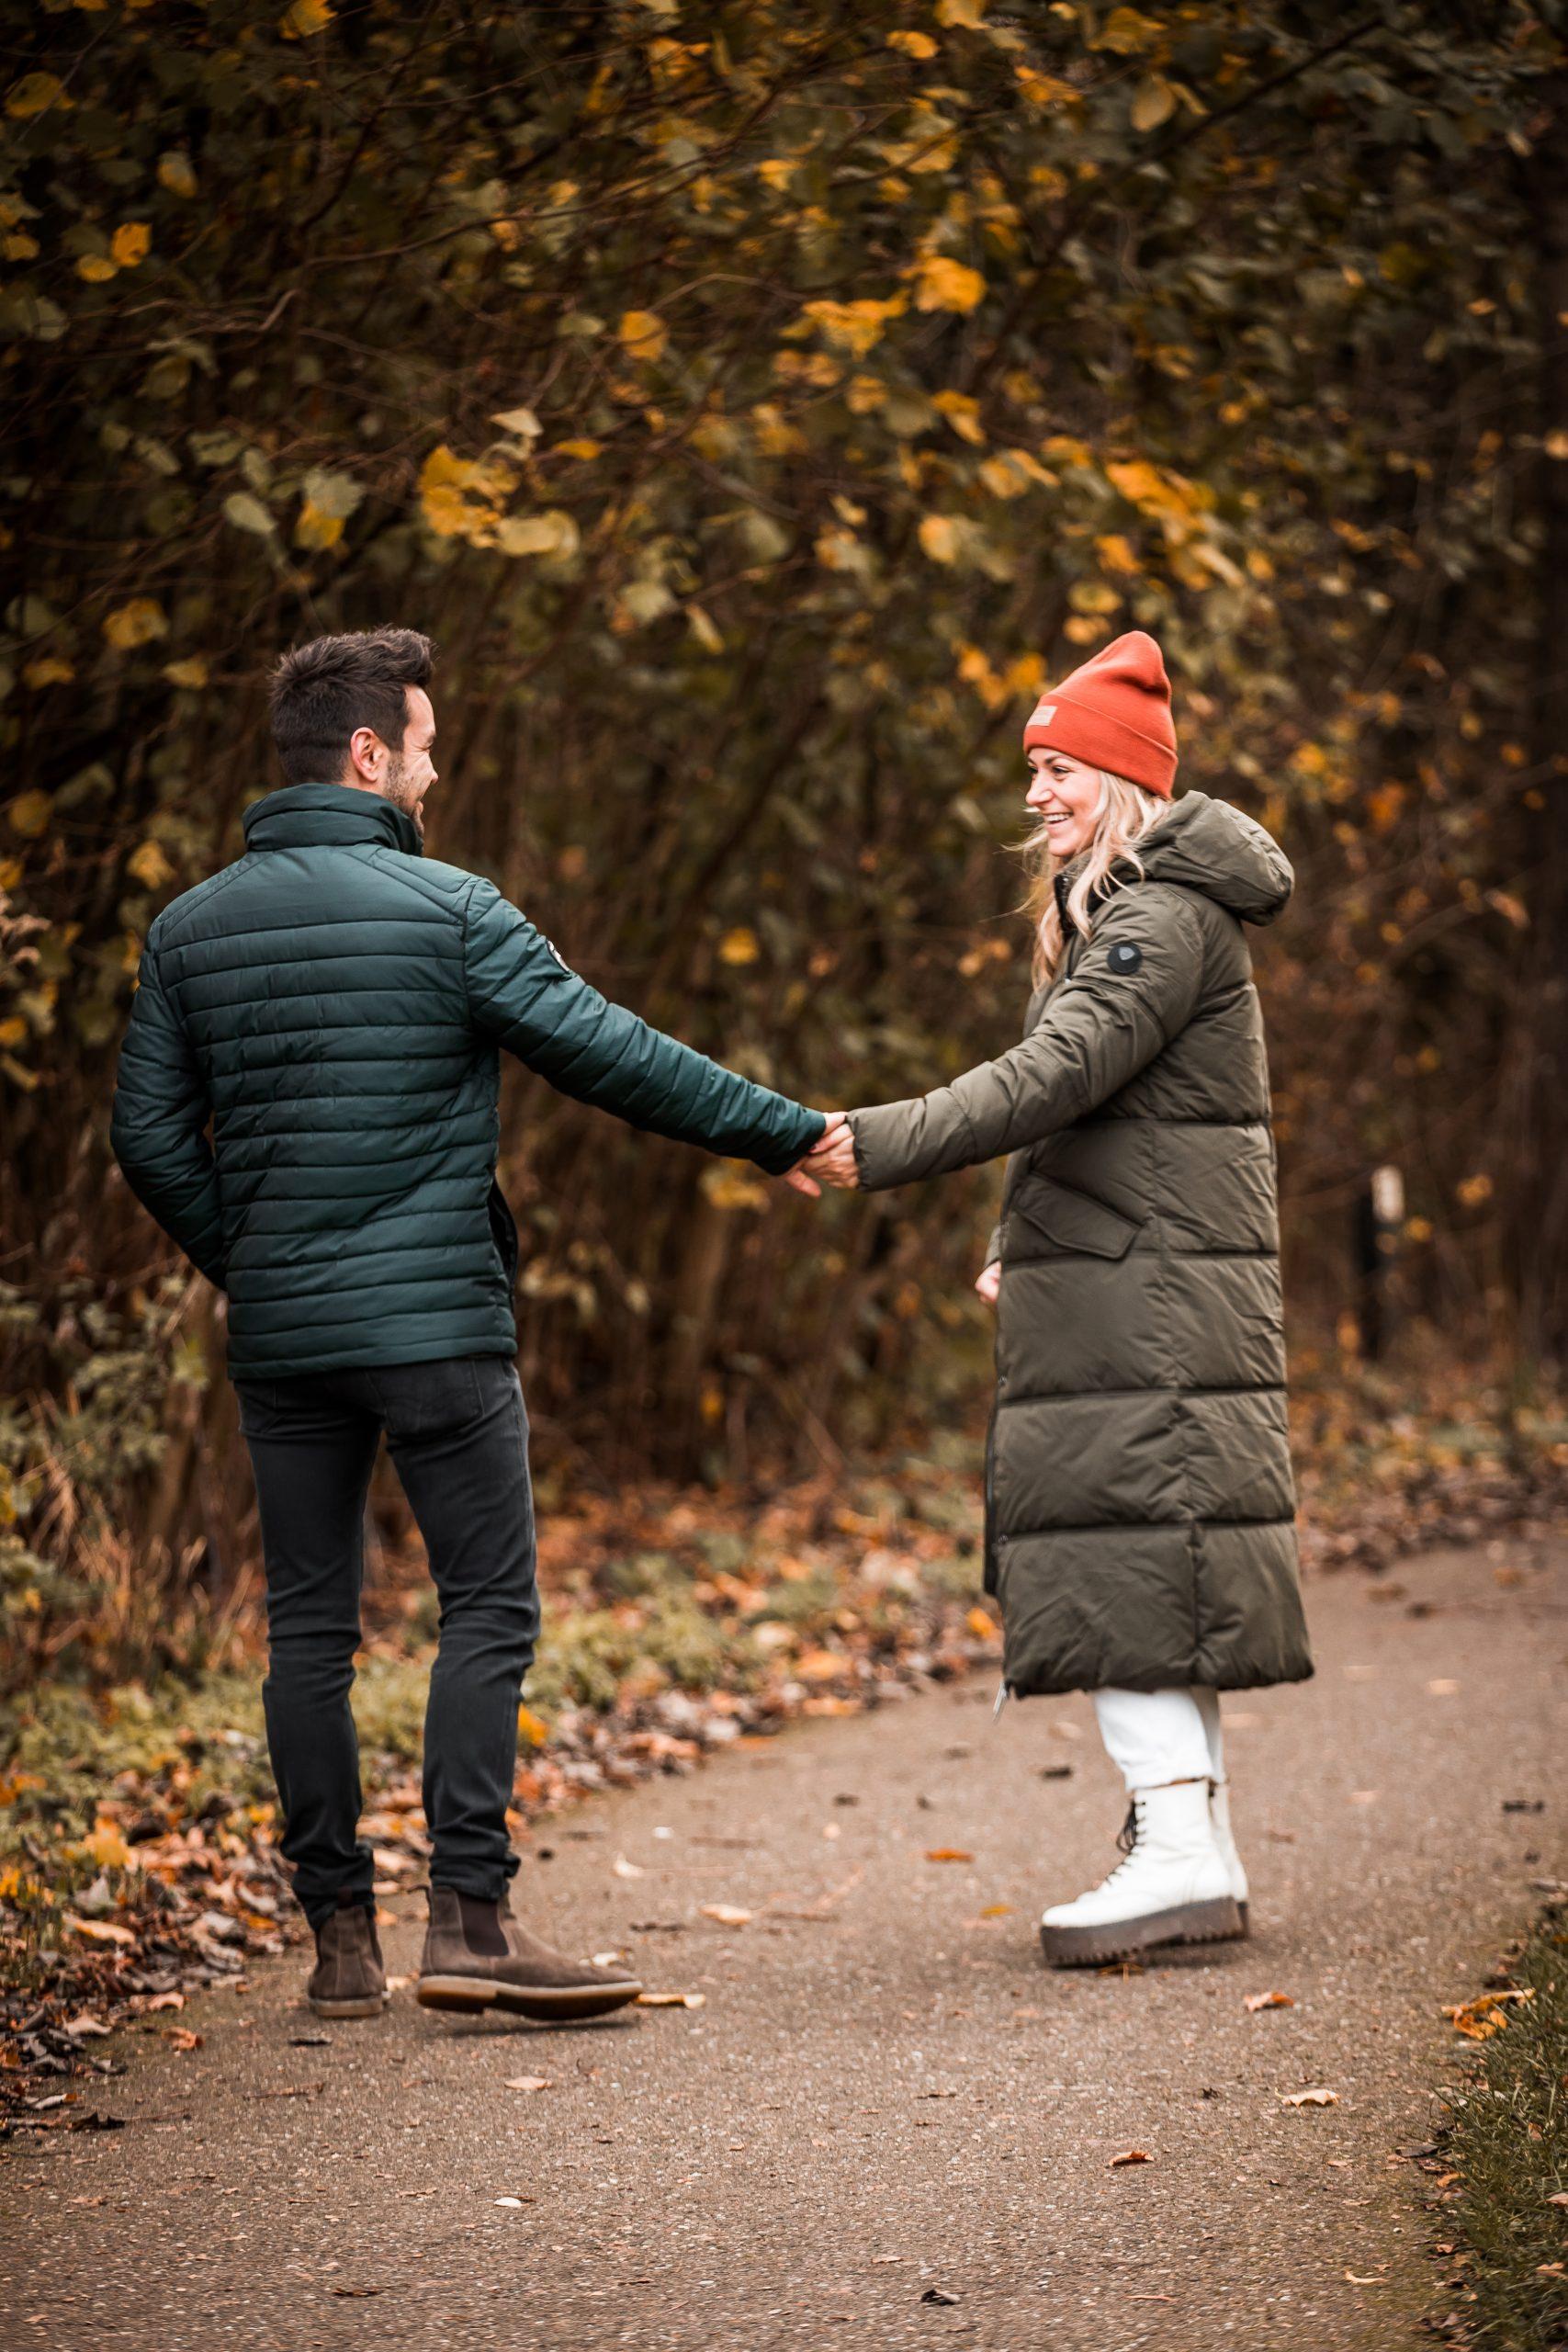 winterjassen, jas, winterjas, plutosport, superdry, dikke jas, warme jas, lange jas, mannen jas, dames jas, winter, herfst